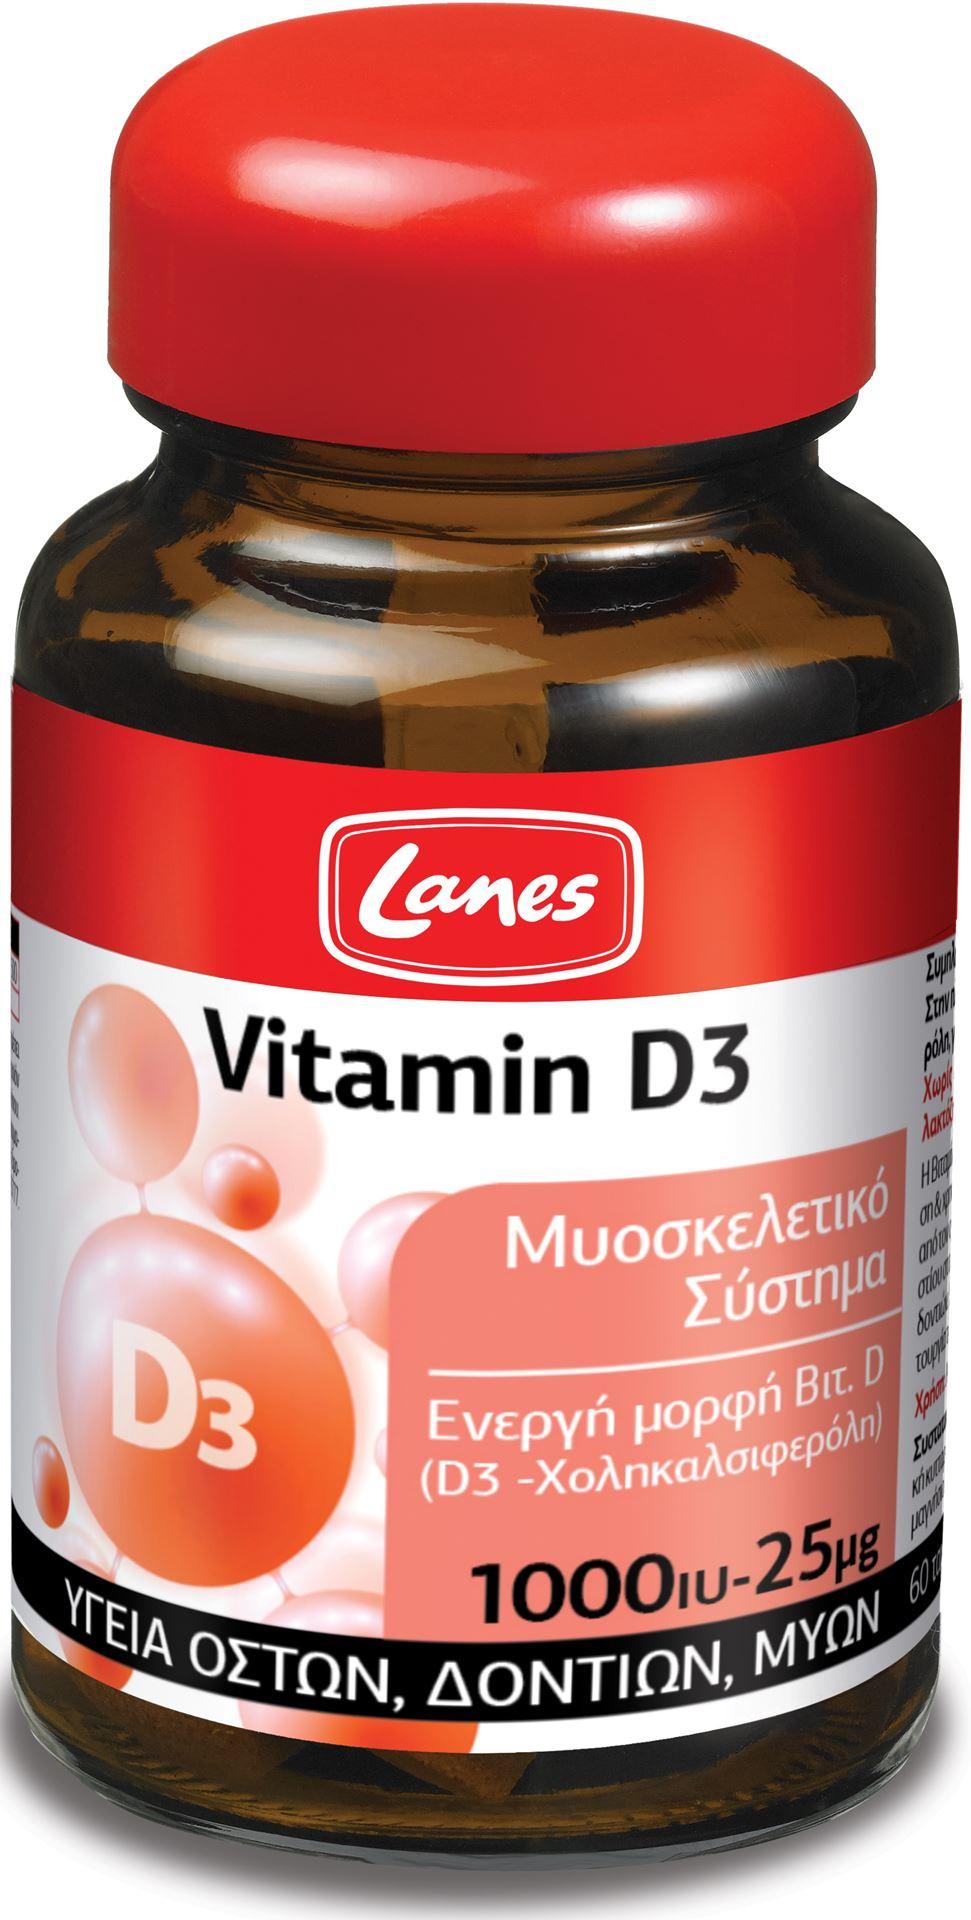 Lanes Vitamin D3 1000iu-25mg, 60tabs